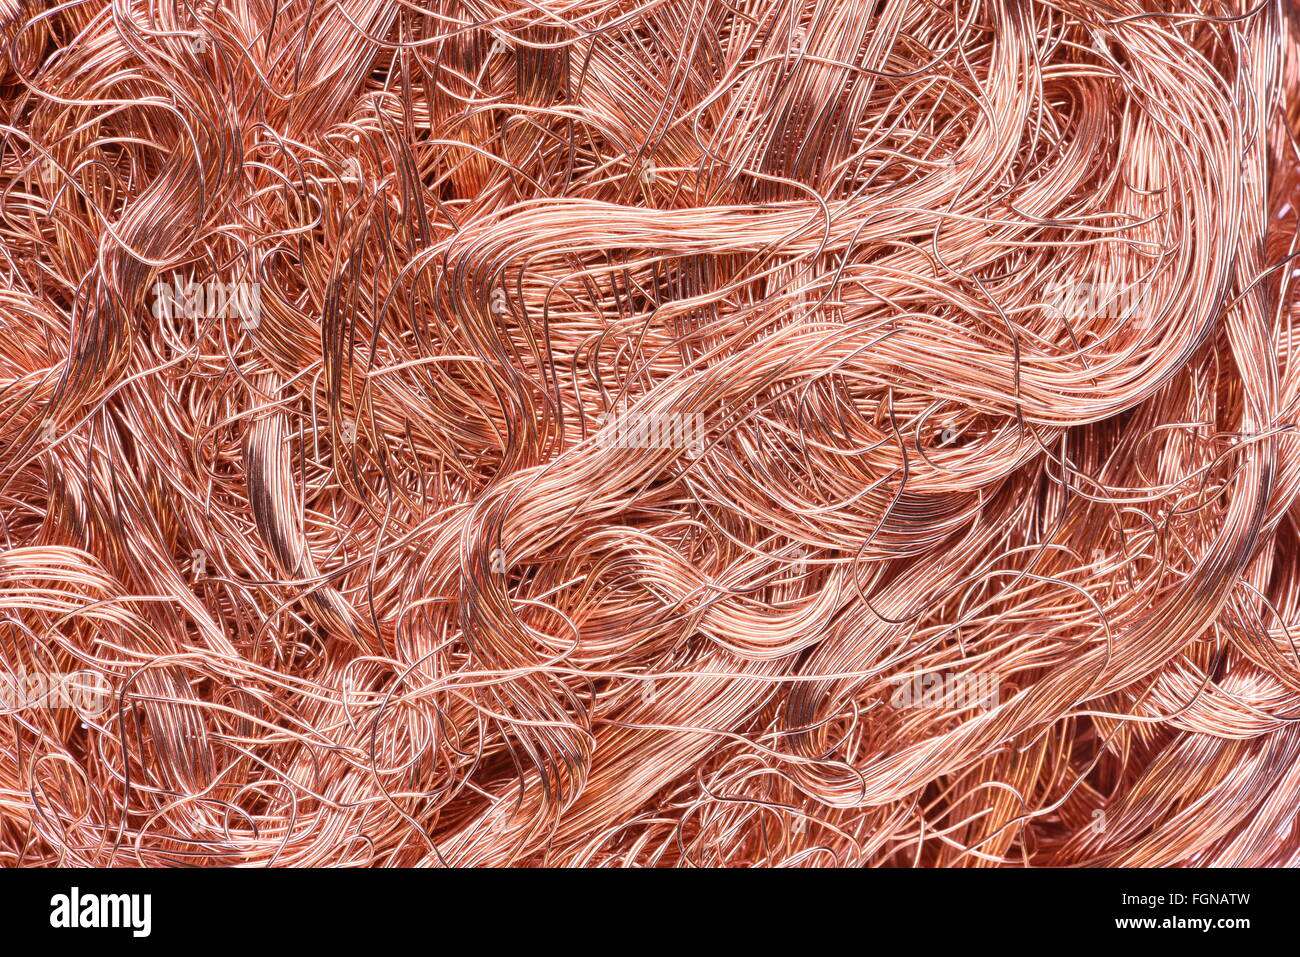 Kupferdraht Industrierohstoffe Stockfoto, Bild: 96355865 - Alamy